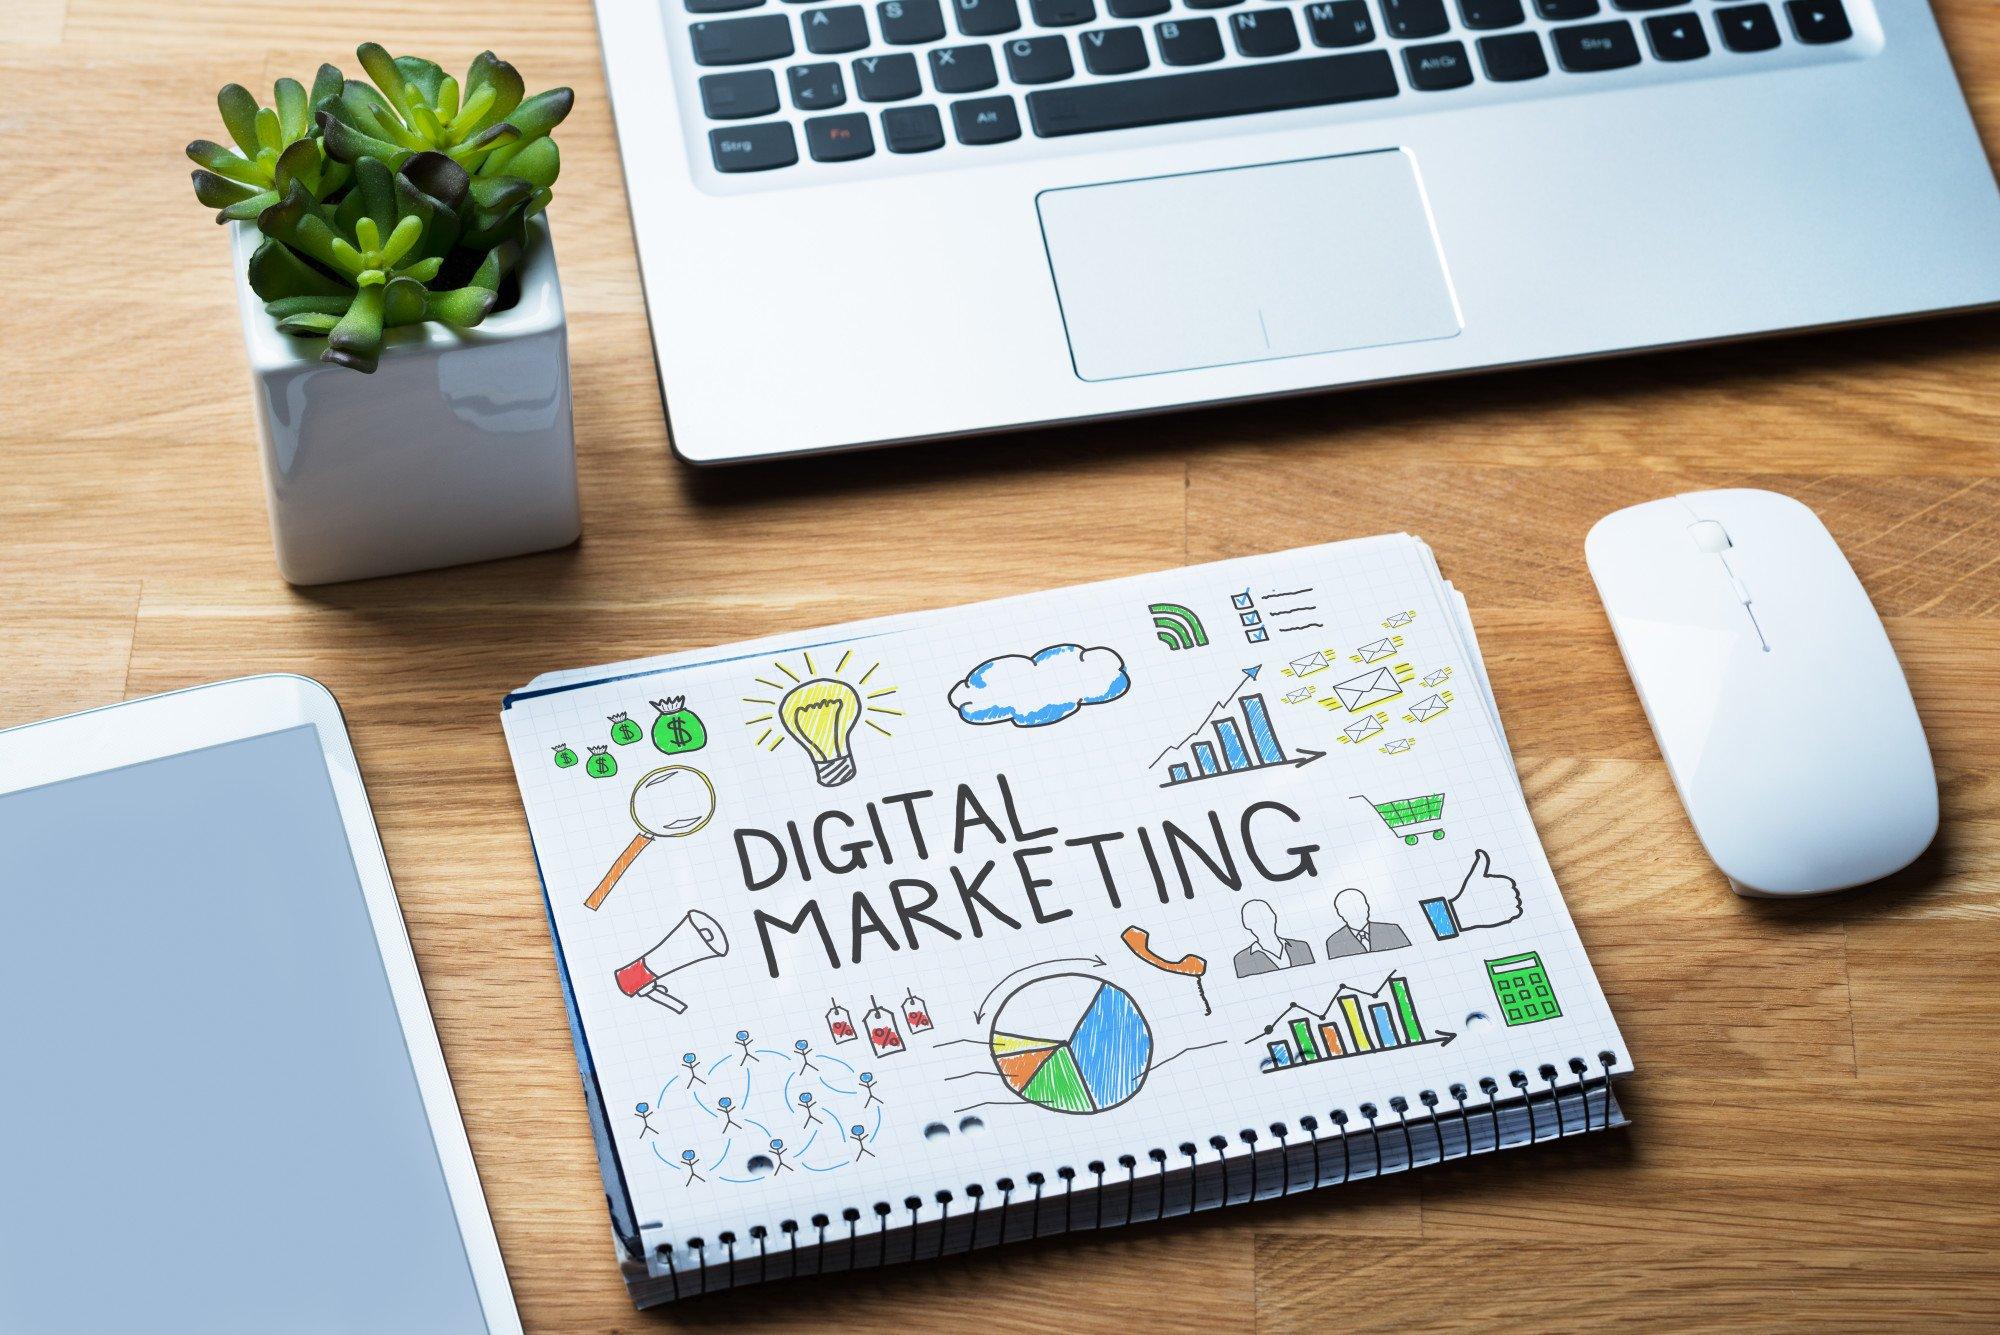 digital marketing sketch on notebook